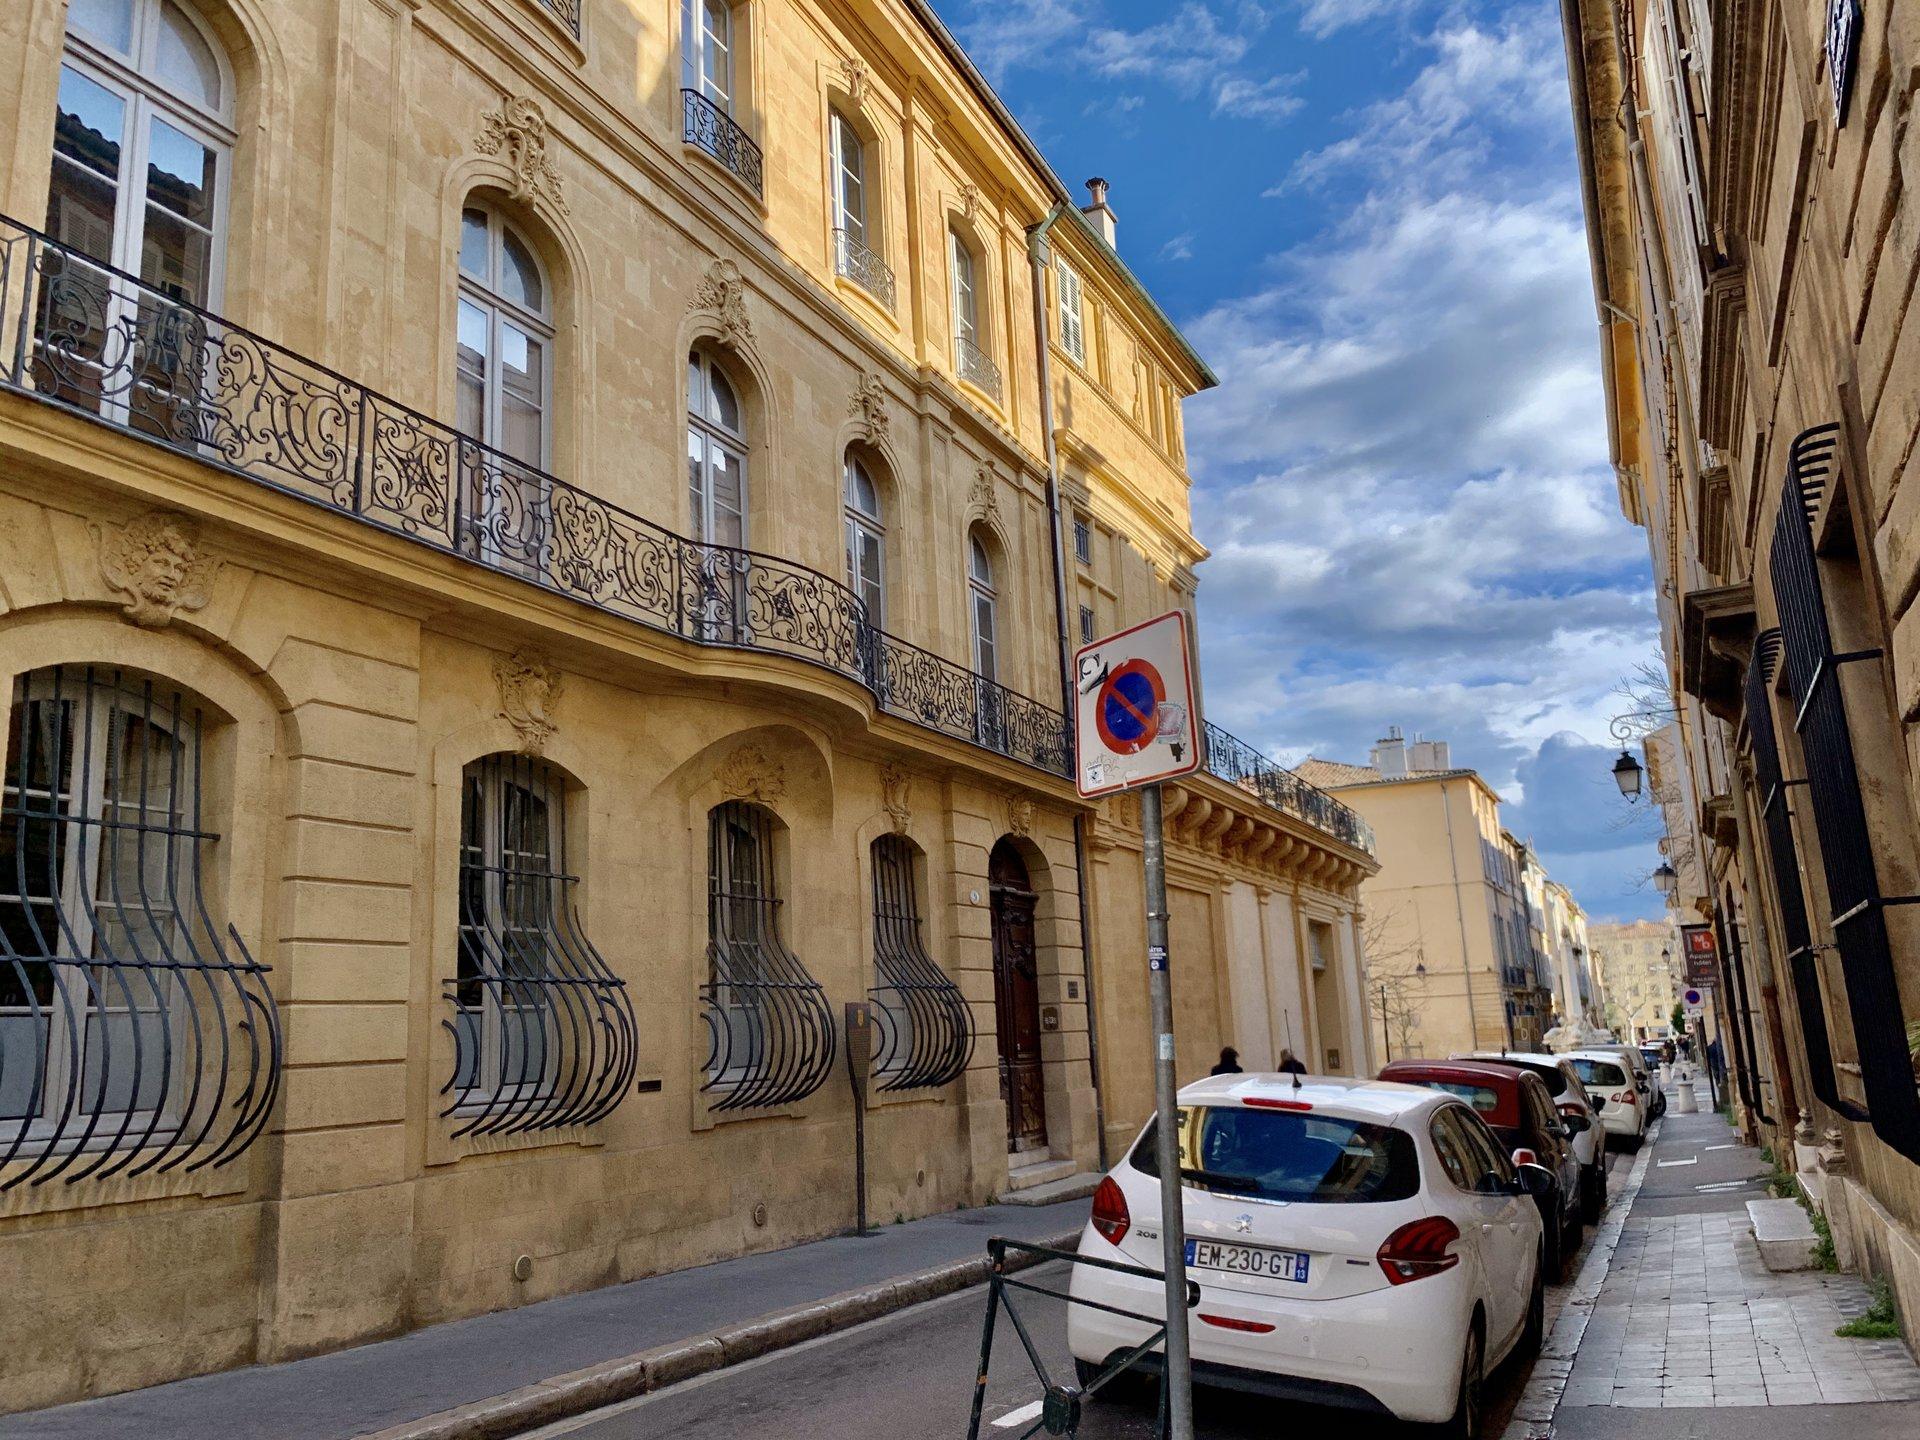 Hotel Particulier / Quartier Mazarin Aix en Provence